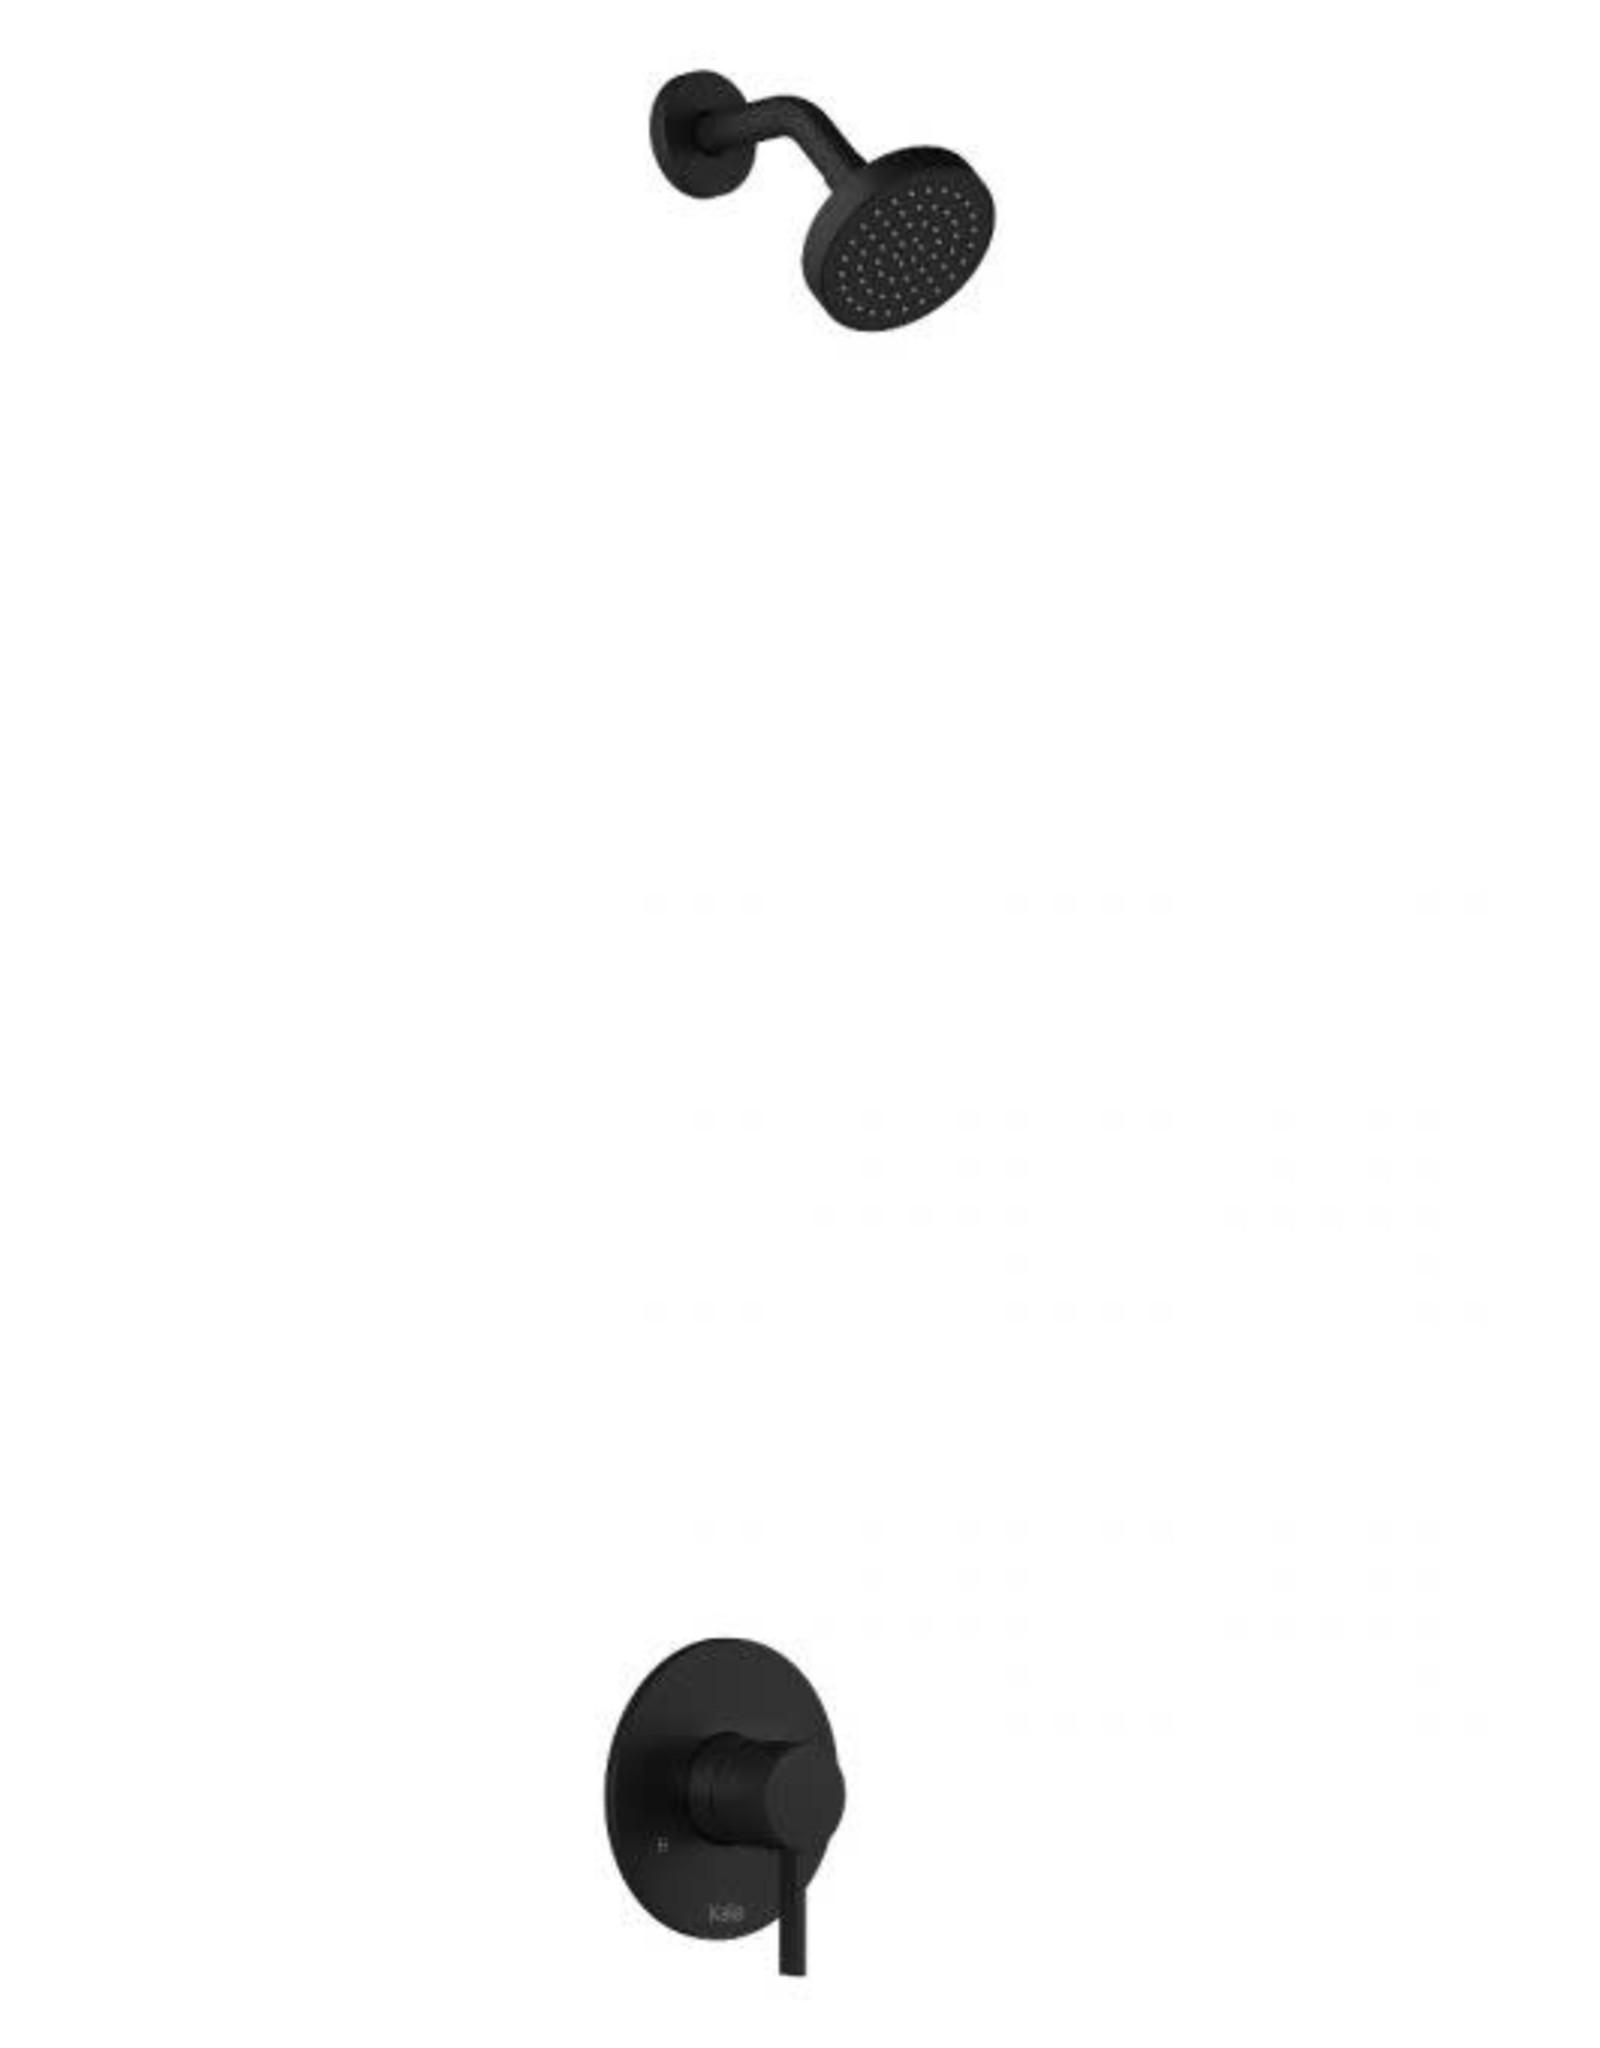 Kalia Kalia Basico PB5- Shower Head- Matte Black